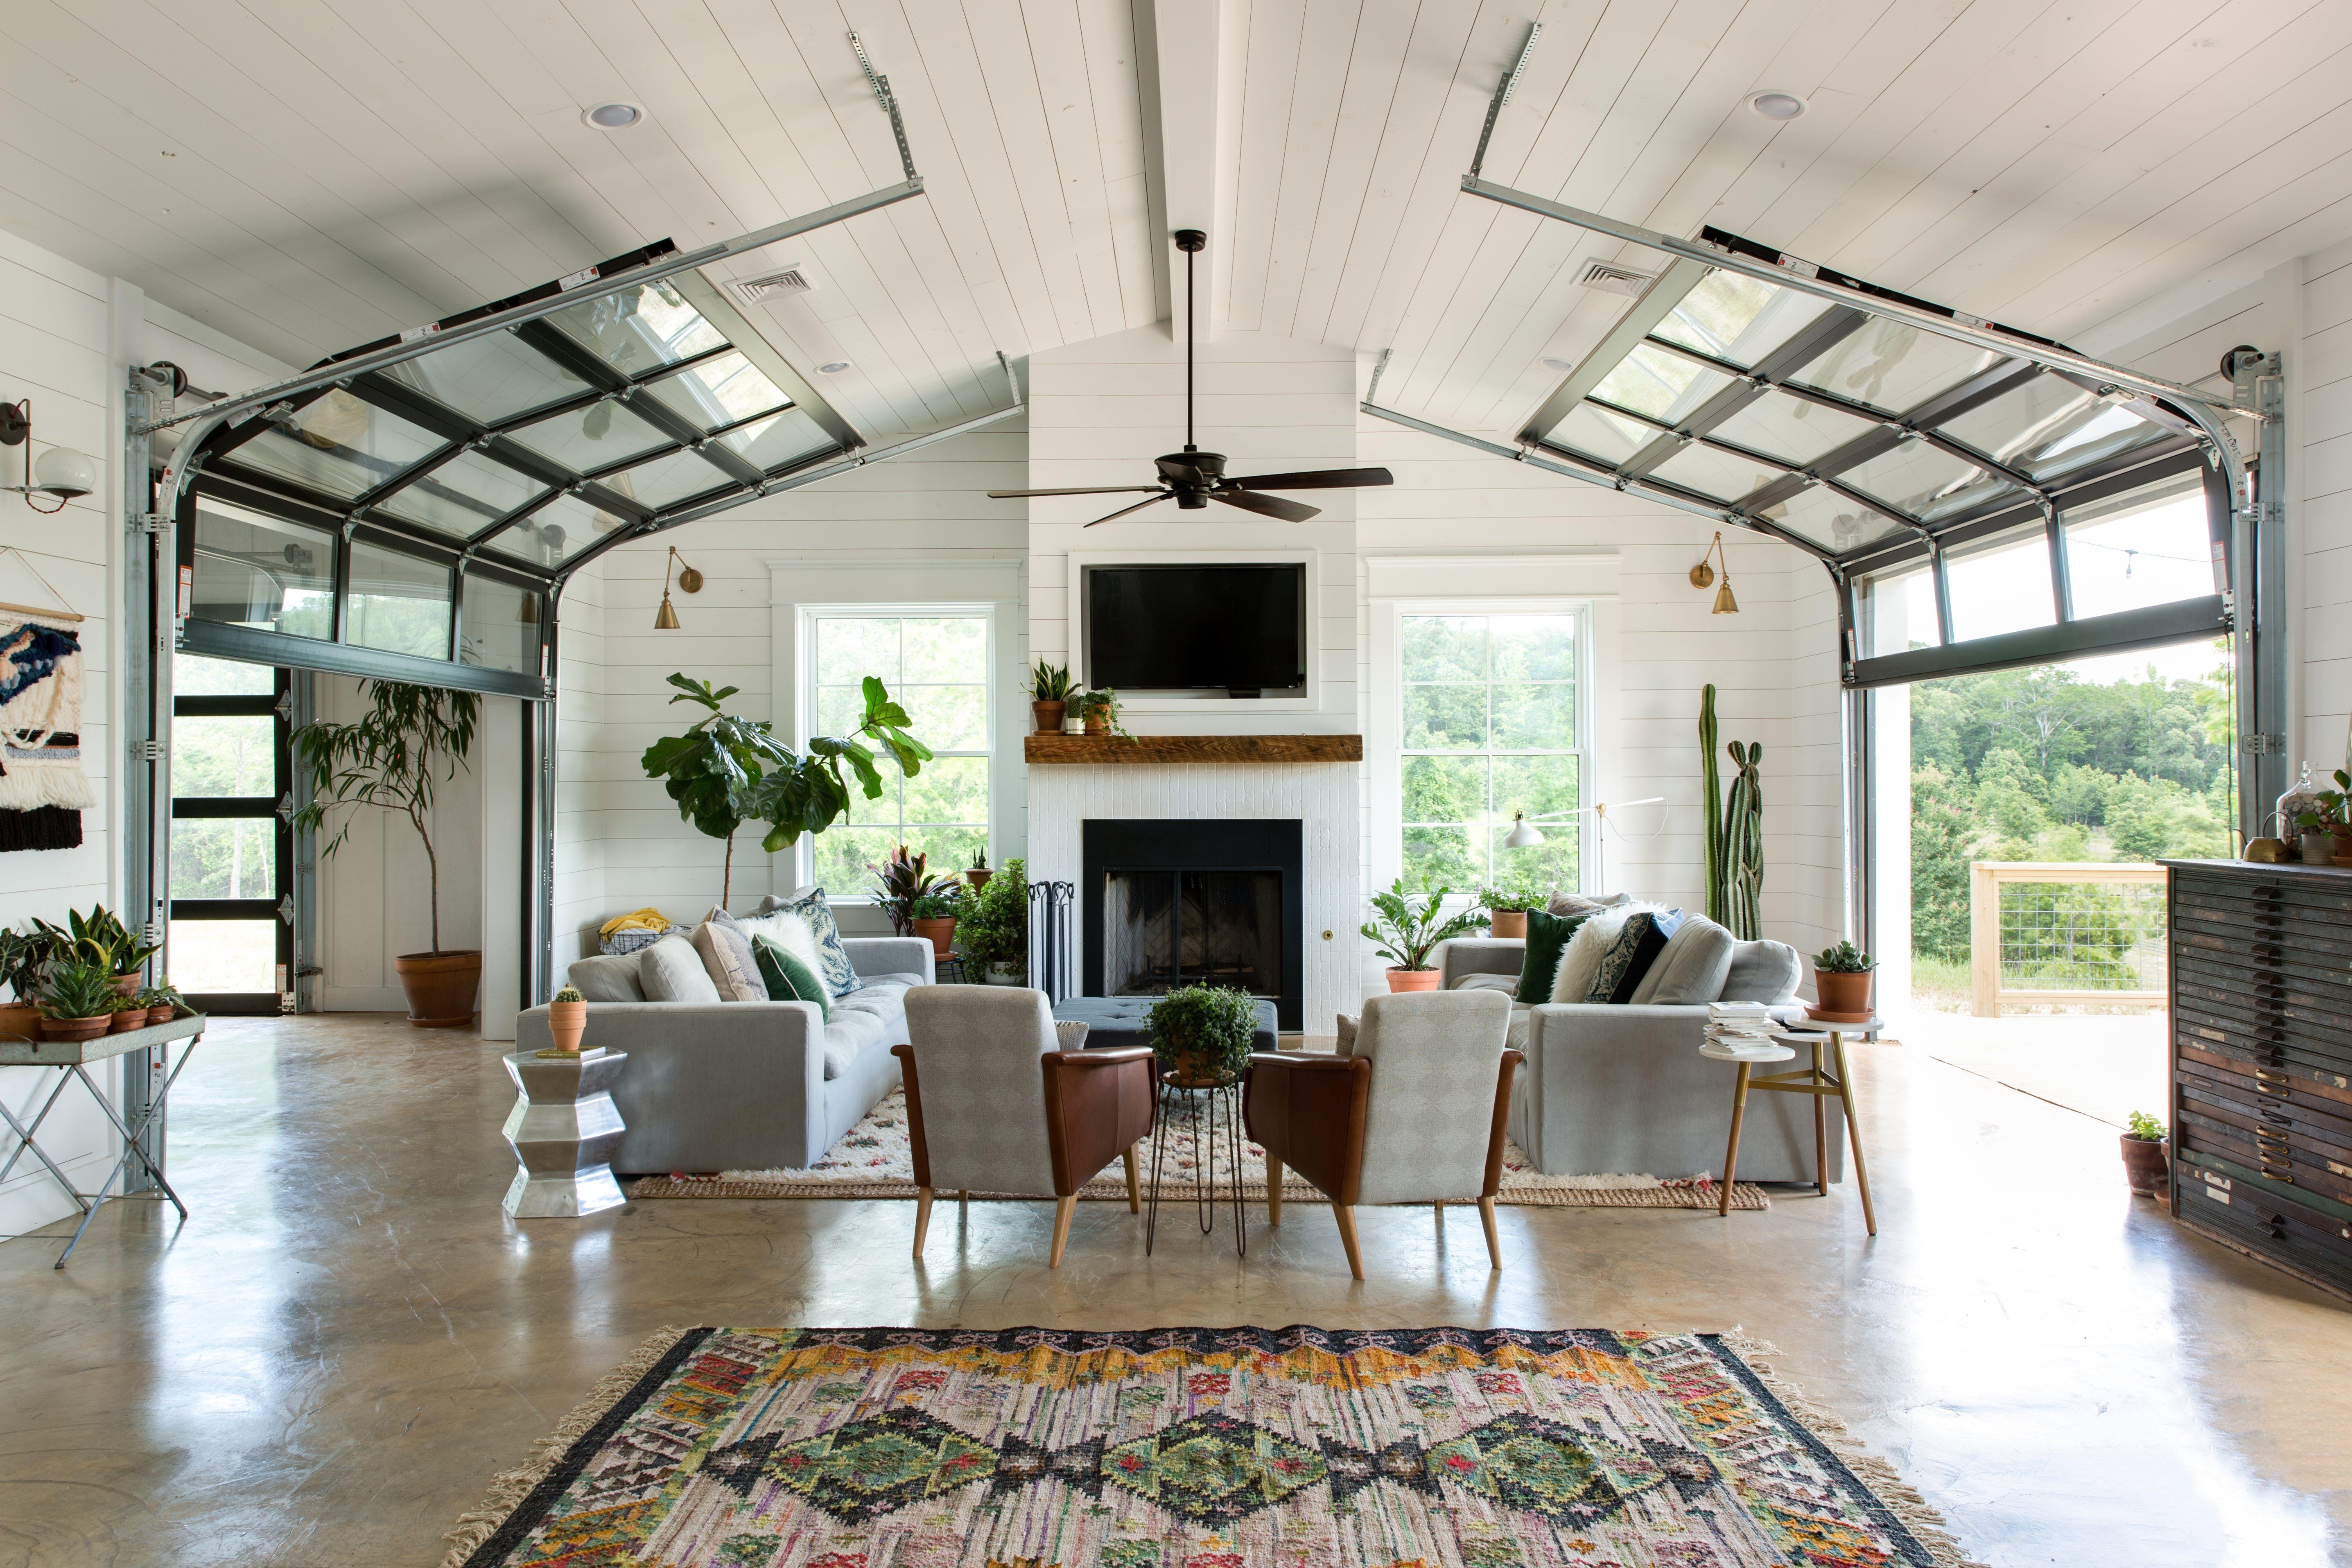 10+ Great Ideas for Modern Barndominium Plans | Modern ...